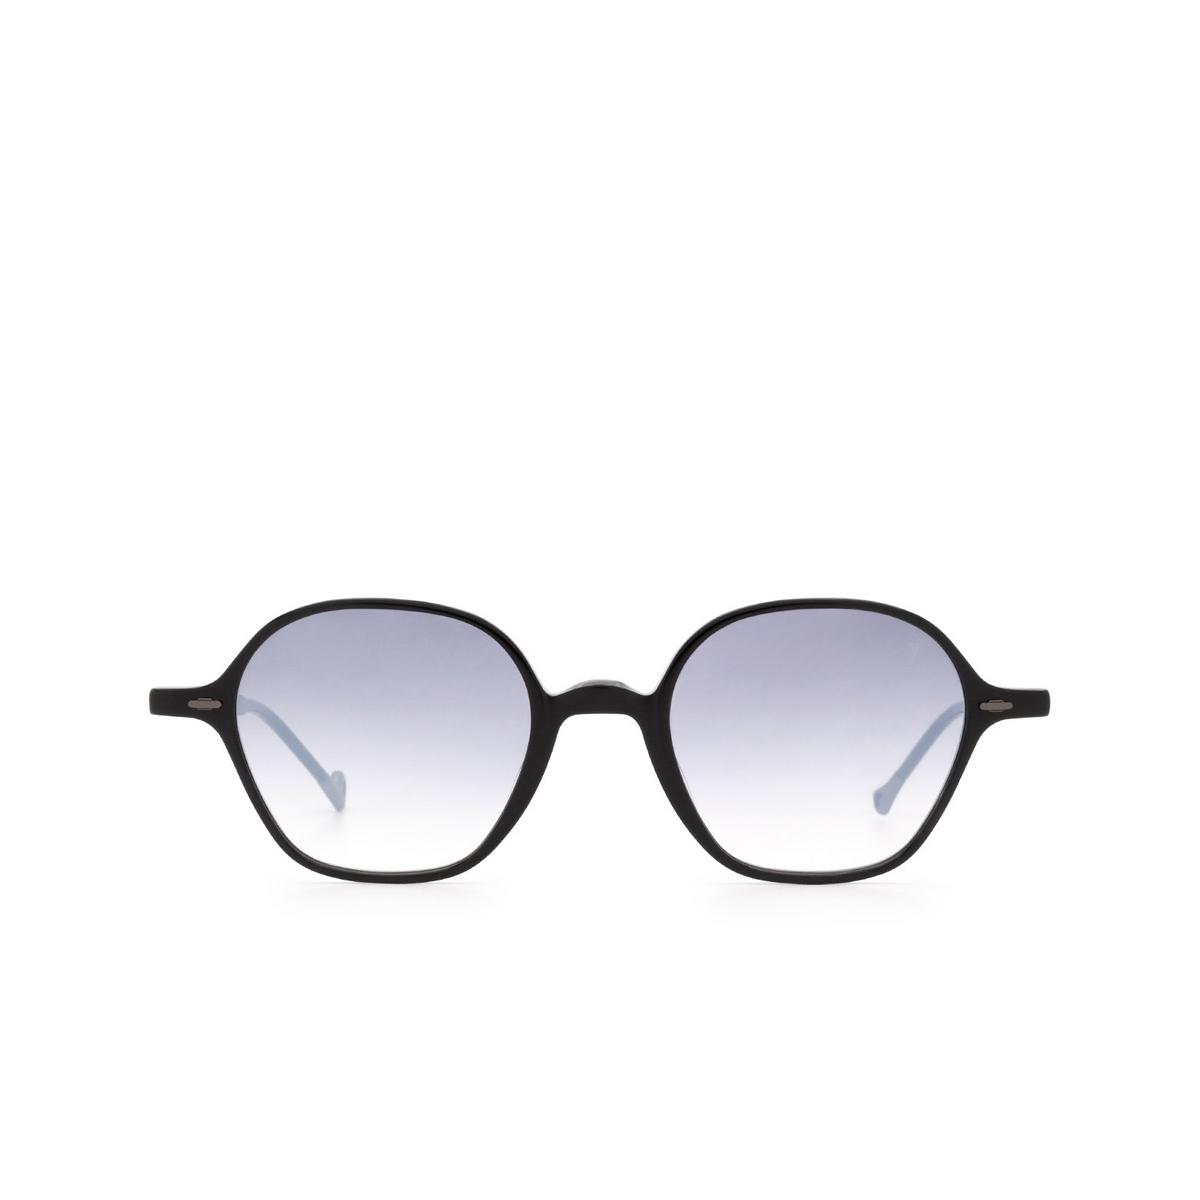 Eyepetizer® Irregular Sunglasses: Visconti color Black C.A-27F - front view.